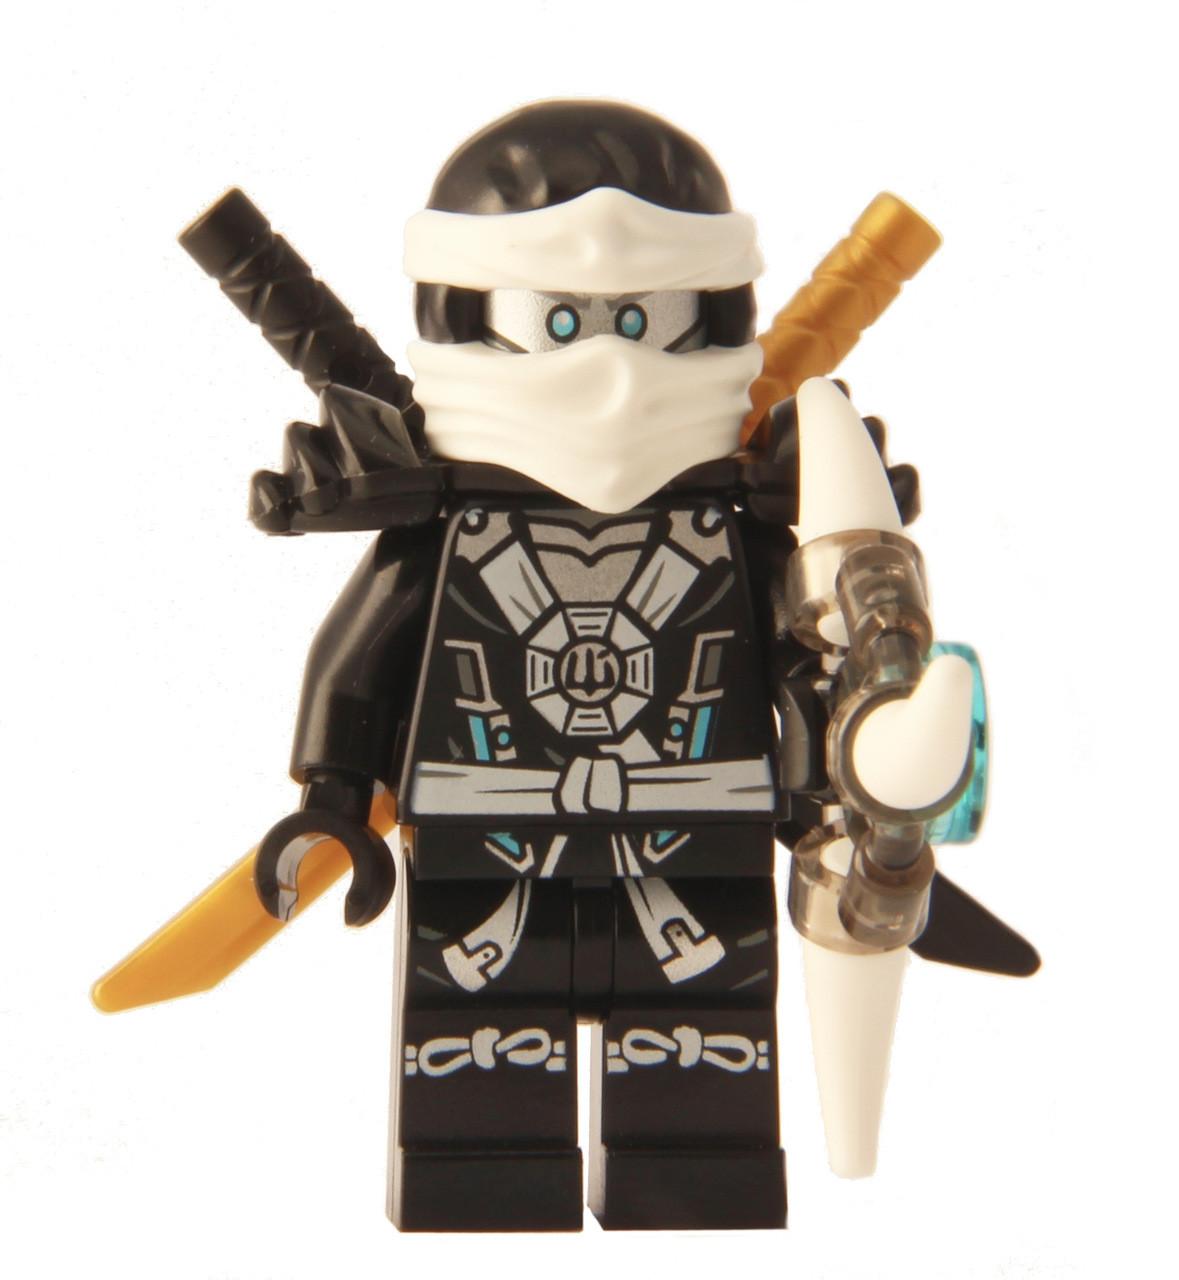 Lego ninjago zane deepstone minifigure 2015 with aeroblade the brick people - Lego ninjago 6 ...